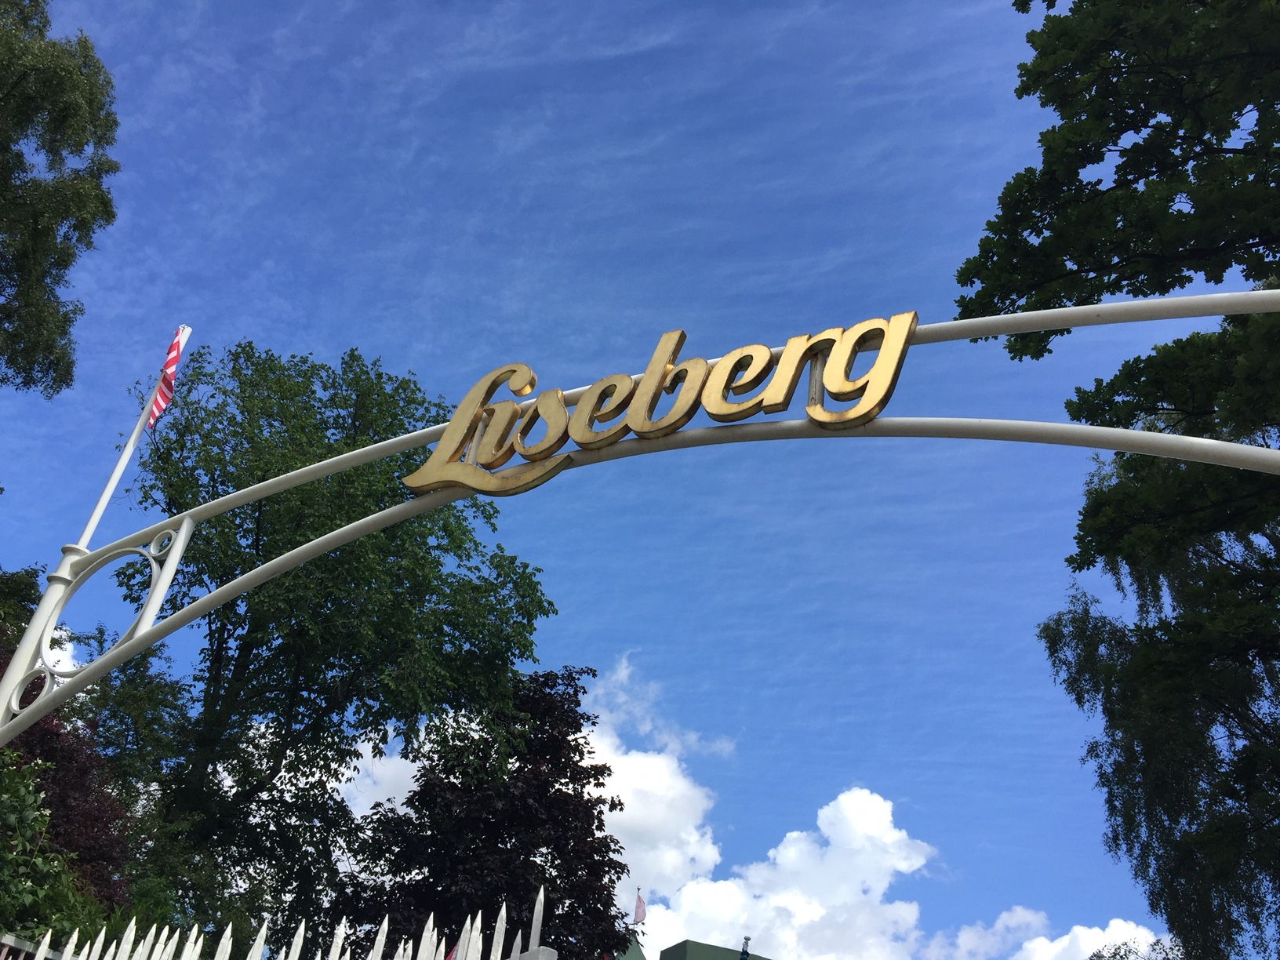 Liseberg skylt